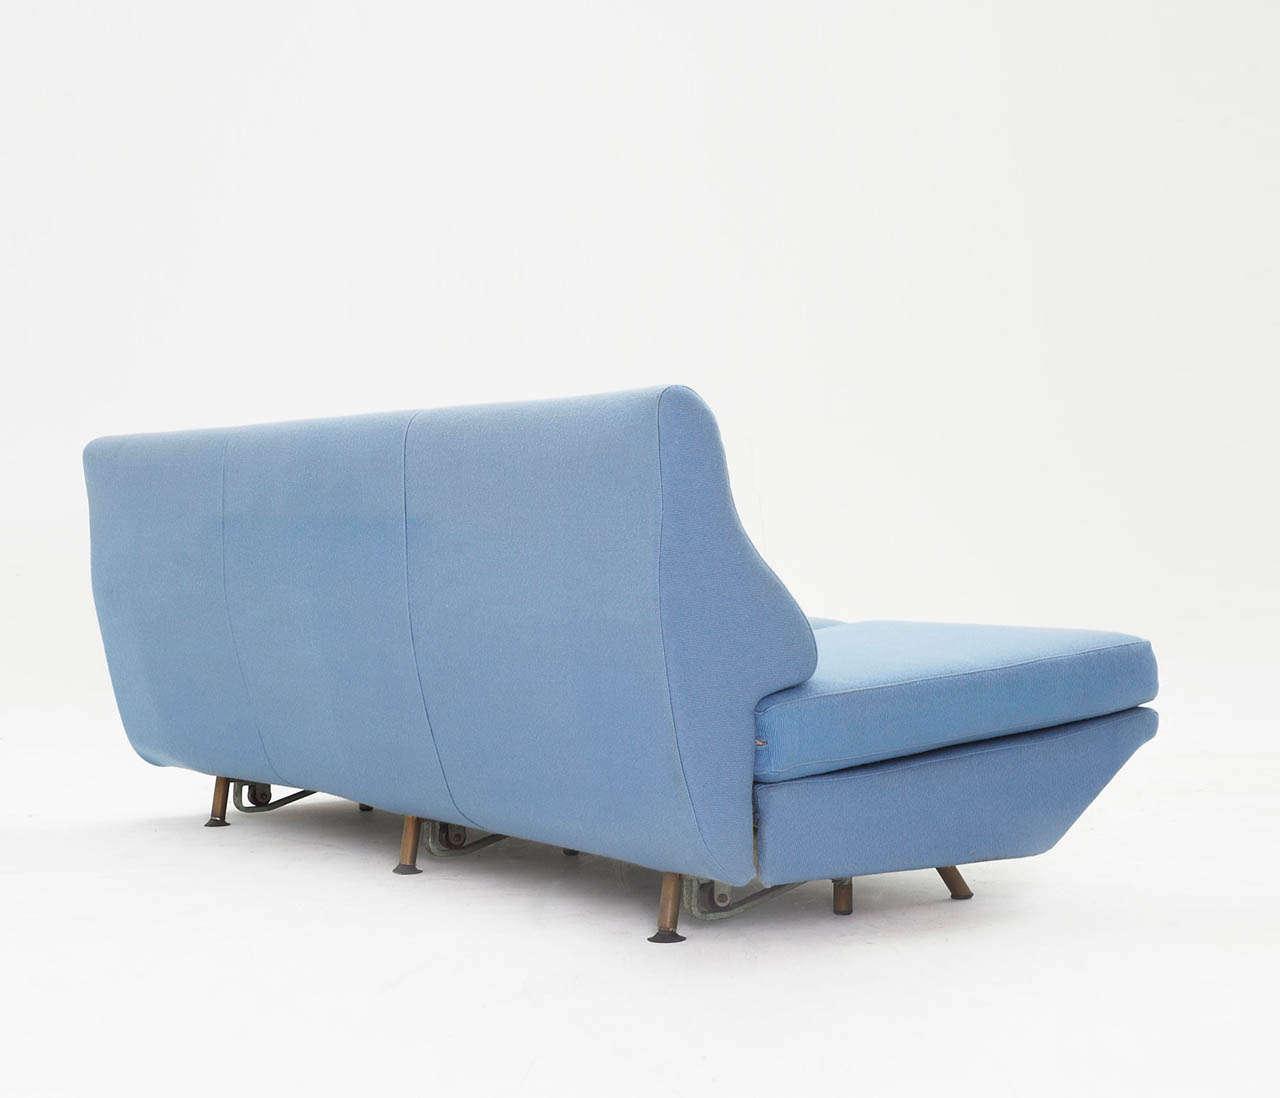 Chaise Longue O Sofa on pillow sofa, chair sofa, table sofa, bedroom sofa, couch sofa, mattress sofa, bench sofa, storage sofa, lounge sofa, fabric sofa, bookcase sofa, cushions sofa, futon sofa, art sofa, ottoman sofa, divan sofa, settee sofa, glider sofa, beds sofa, recliner sofa,